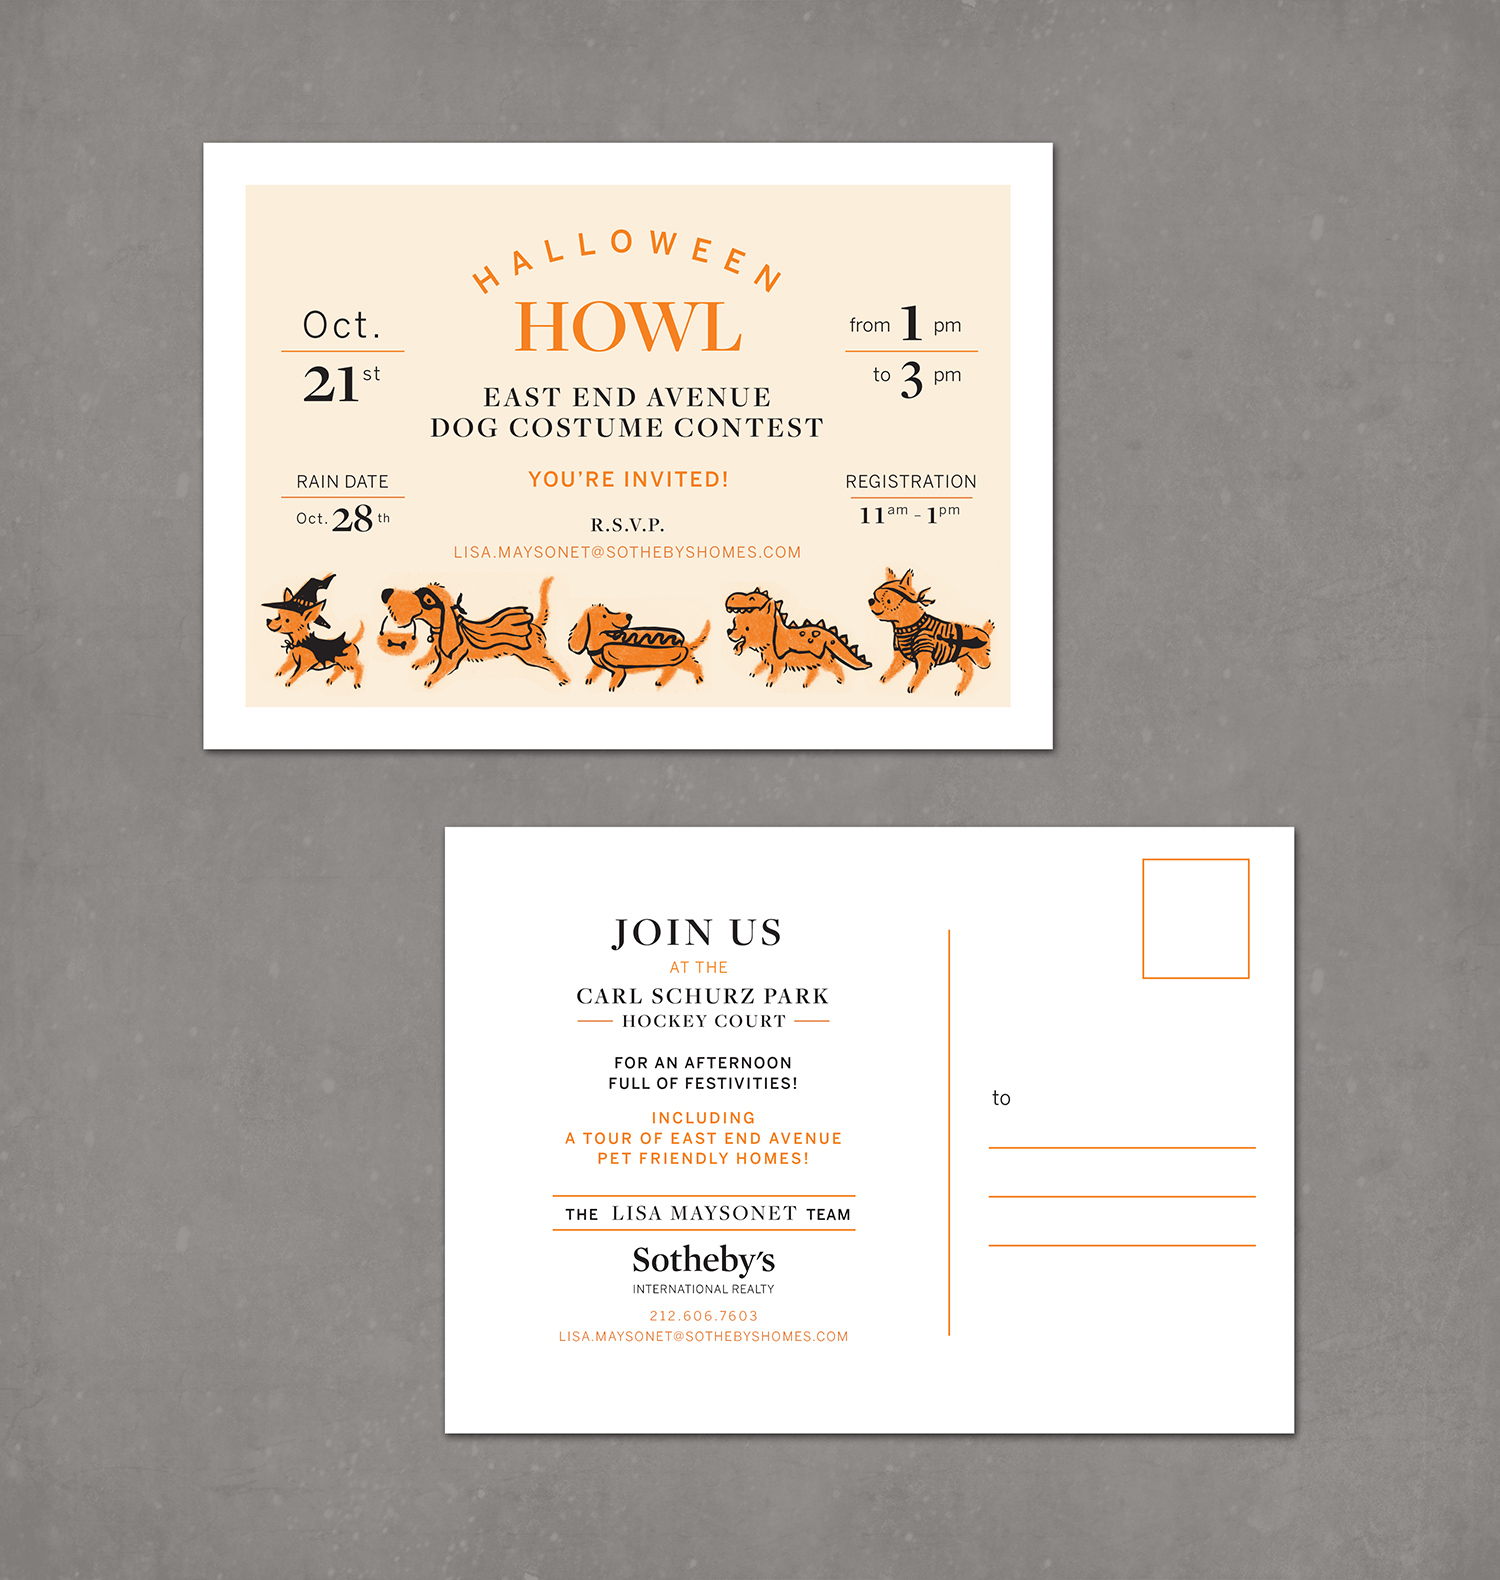 Howl_Postcards_small.jpg